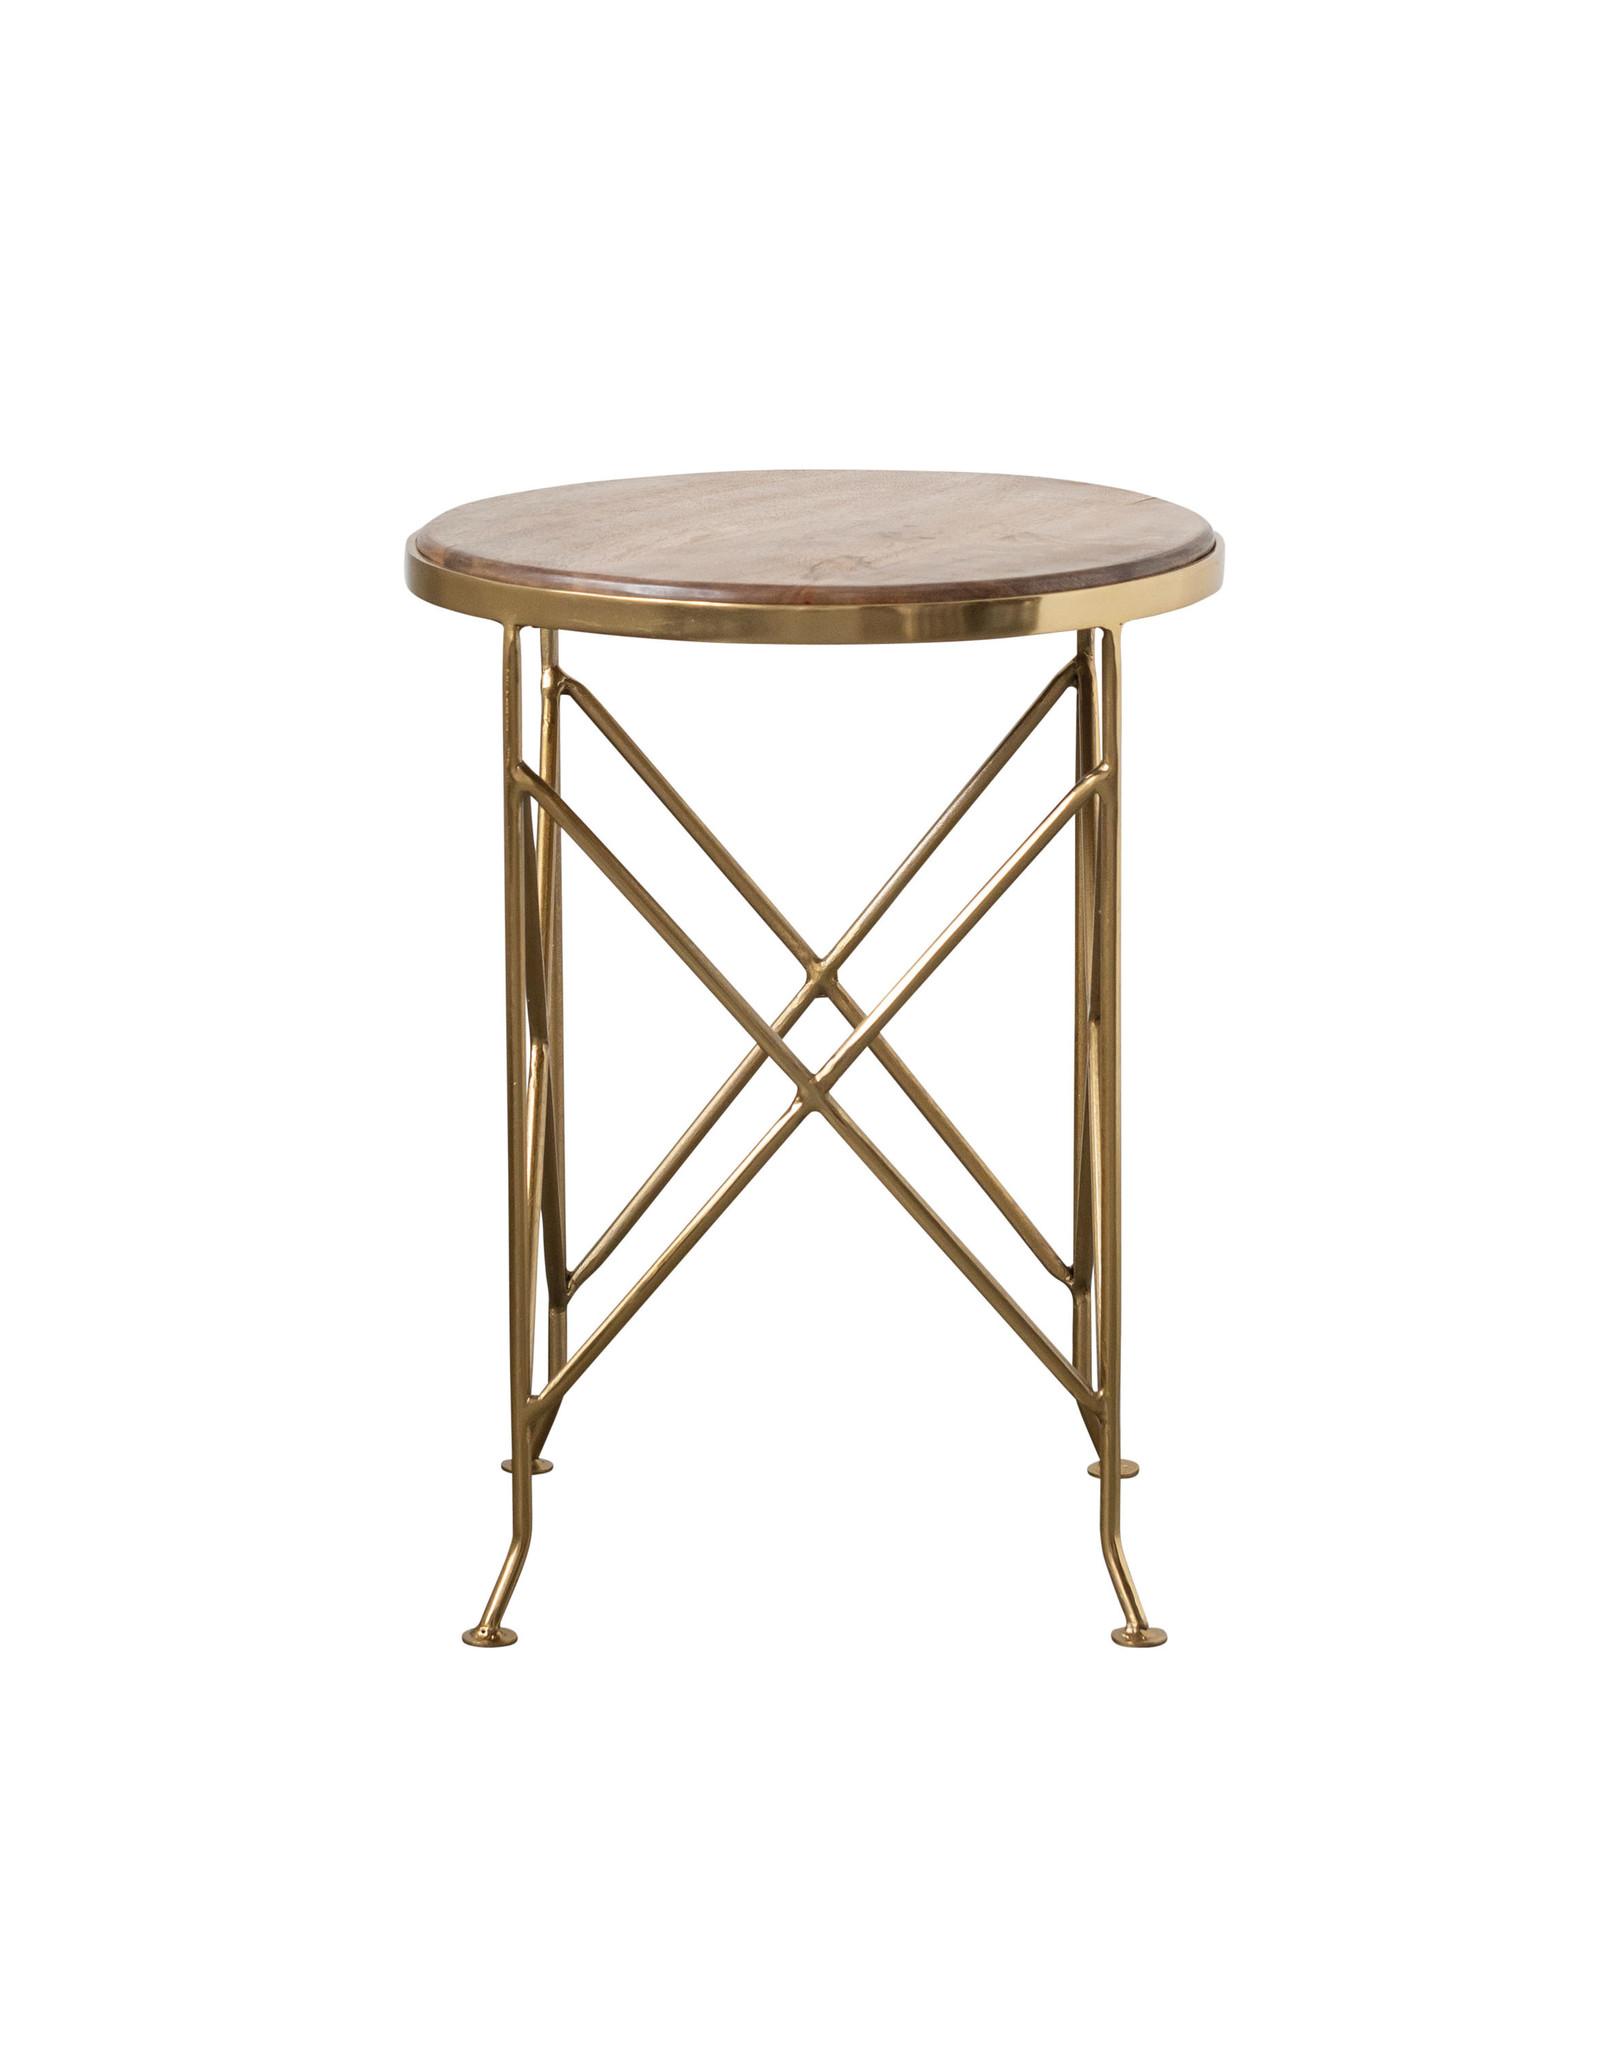 Brown Mango Wood Side Table With Gold Metal Legs Vintage 615